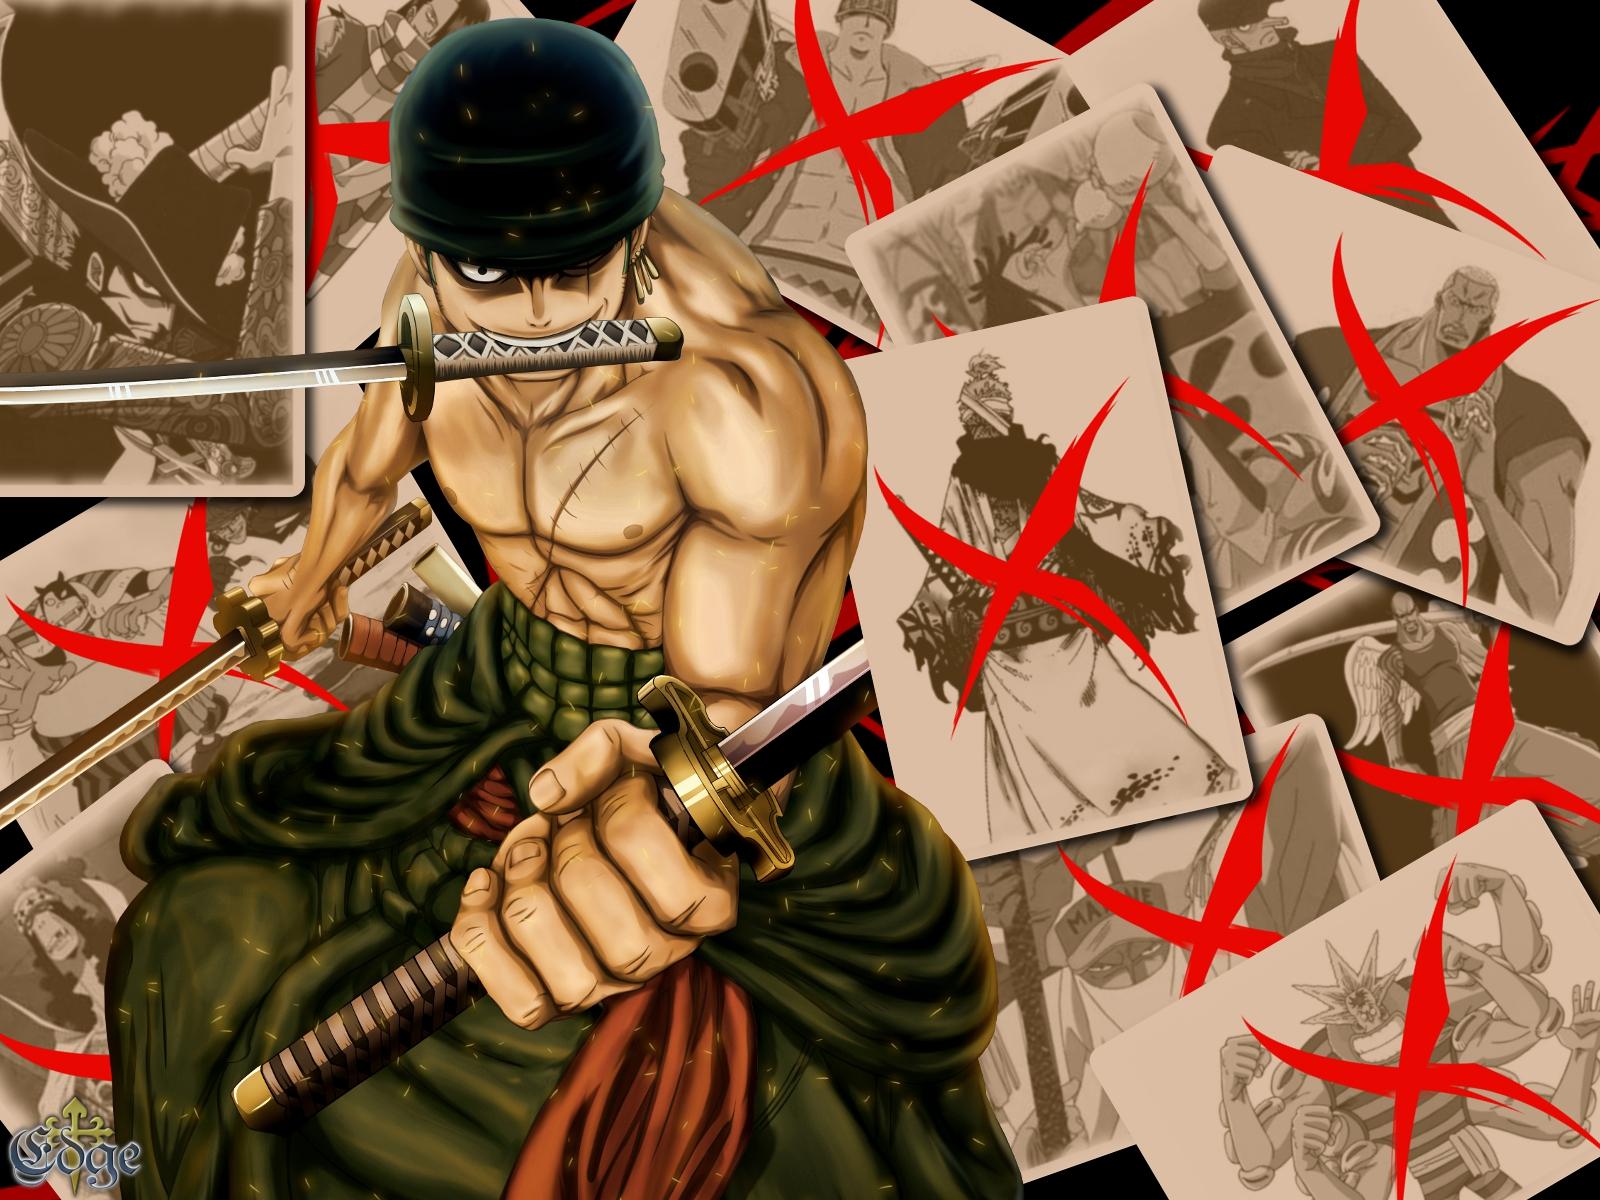 Battles One Piece HD Wallpapers   Design Hey Design Hey   Creative 1600x1200